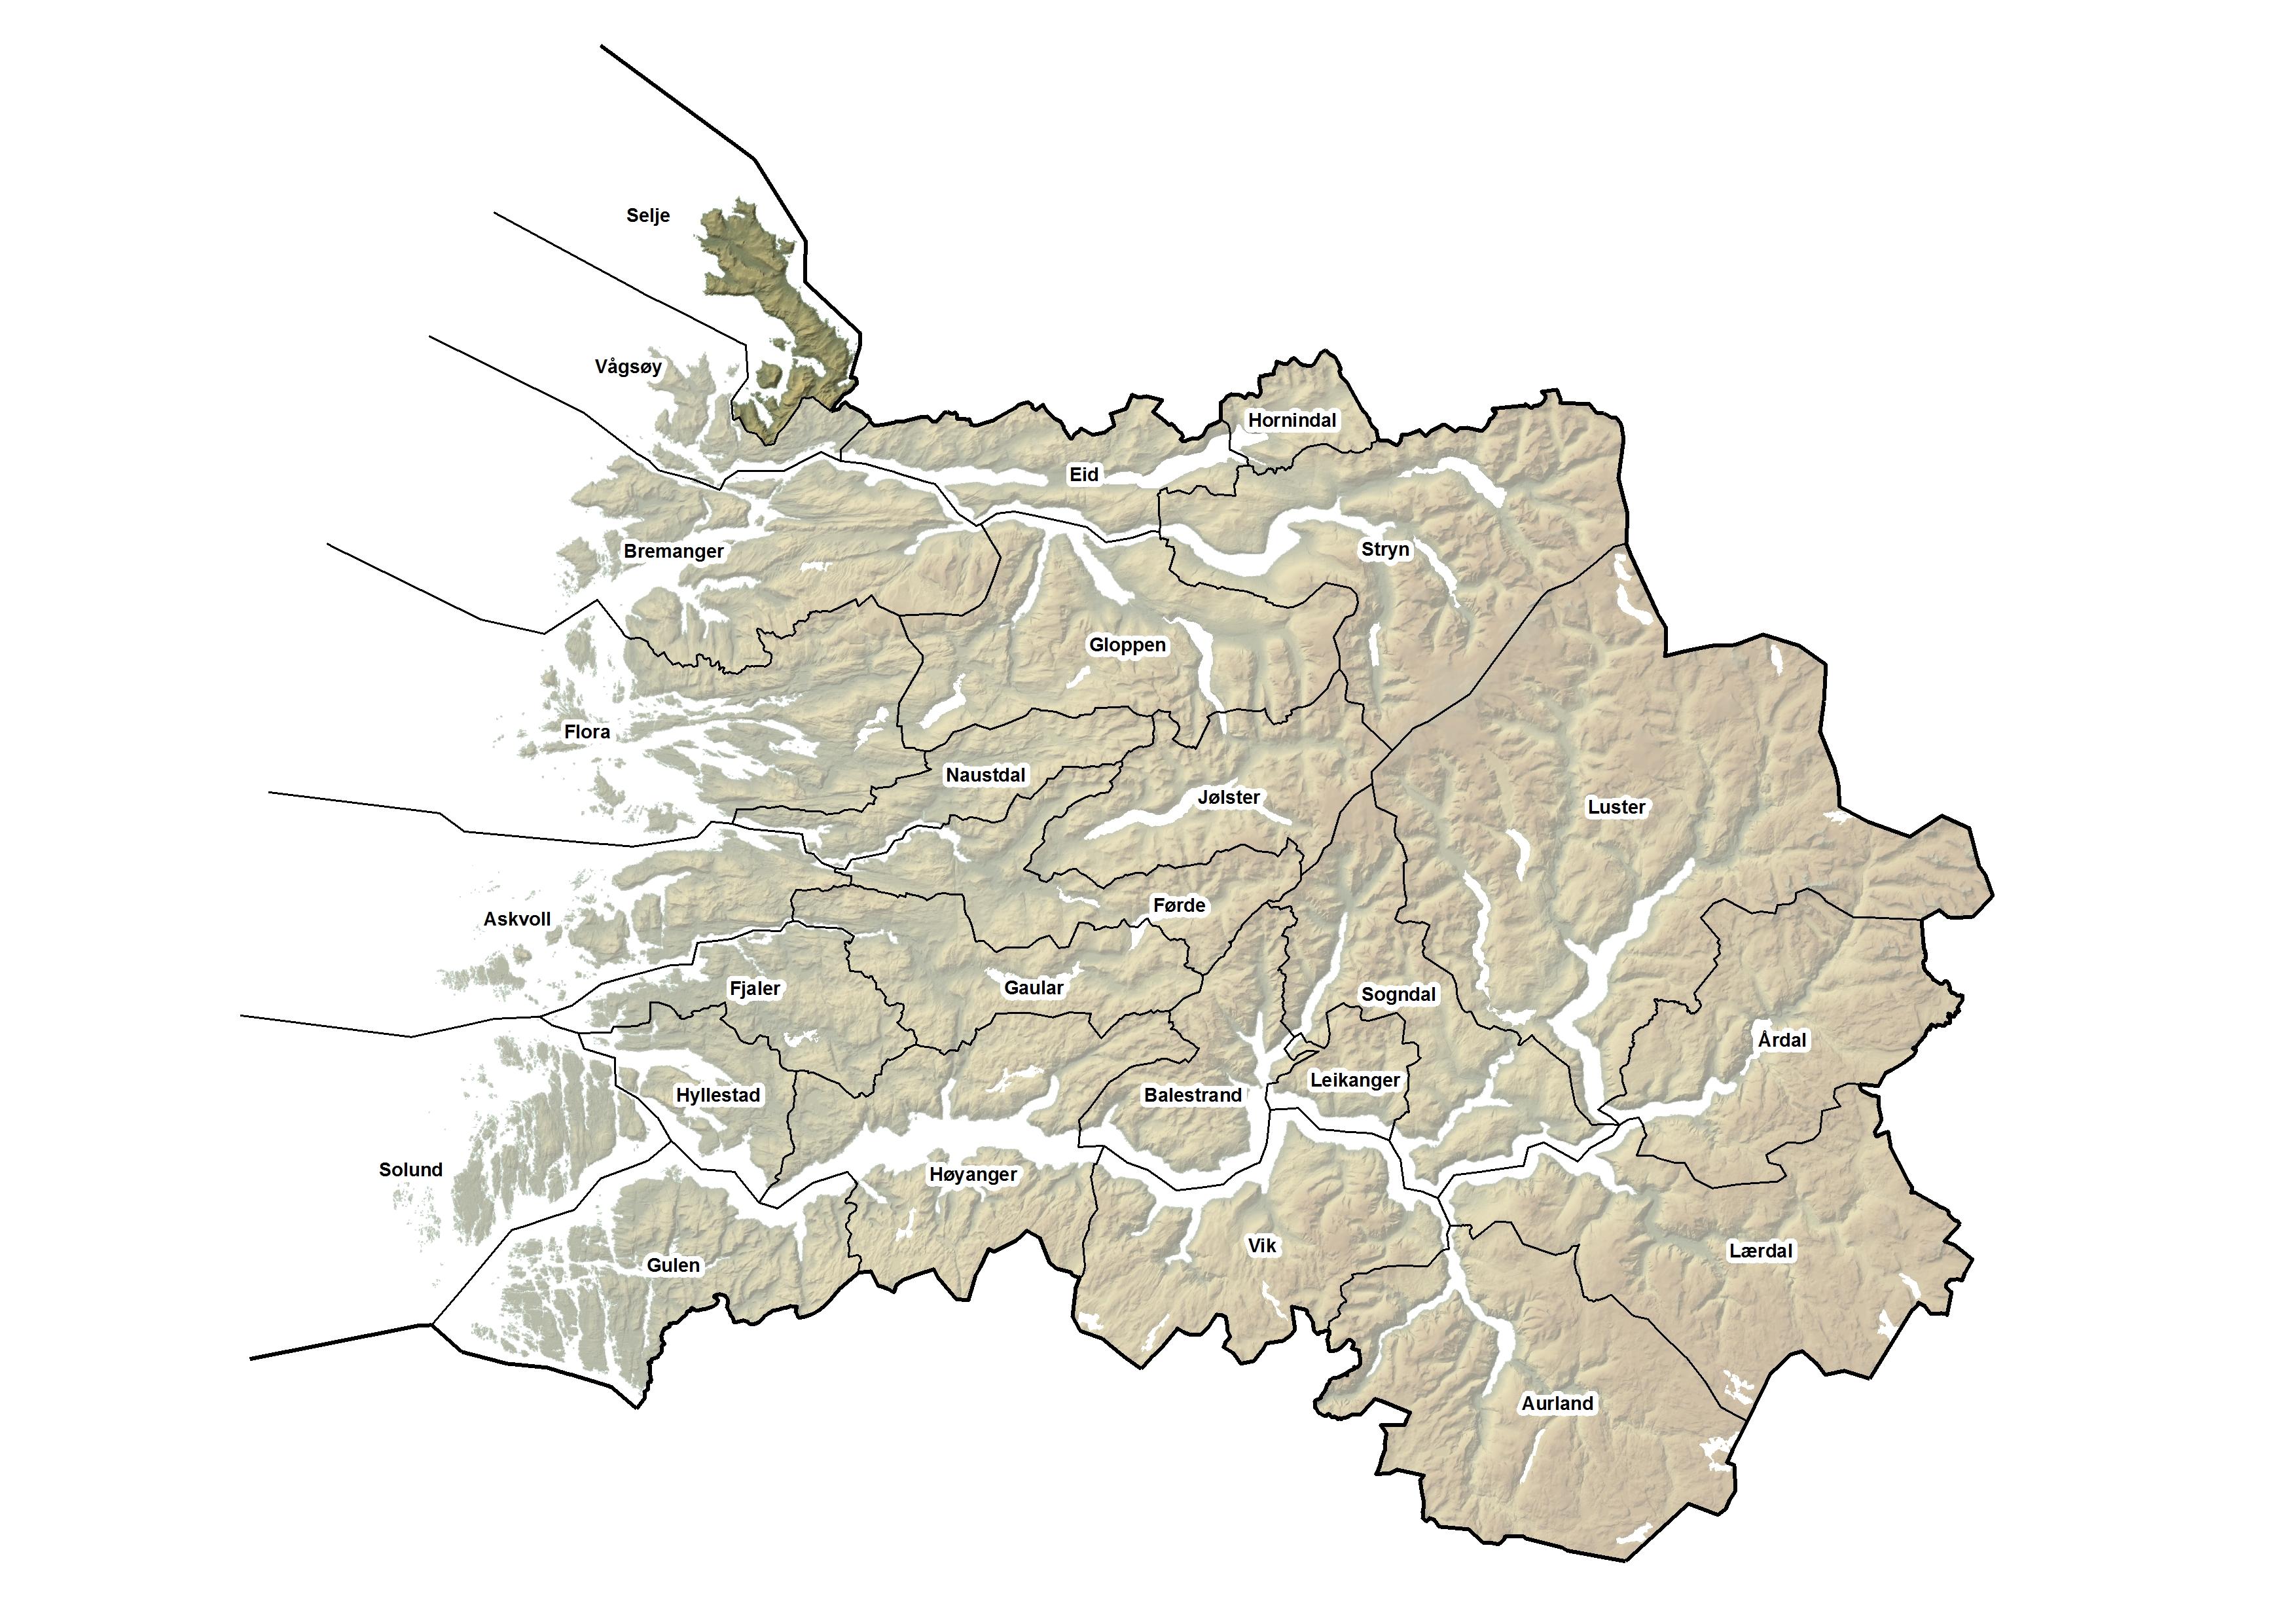 Selje kommune, kart.jpg